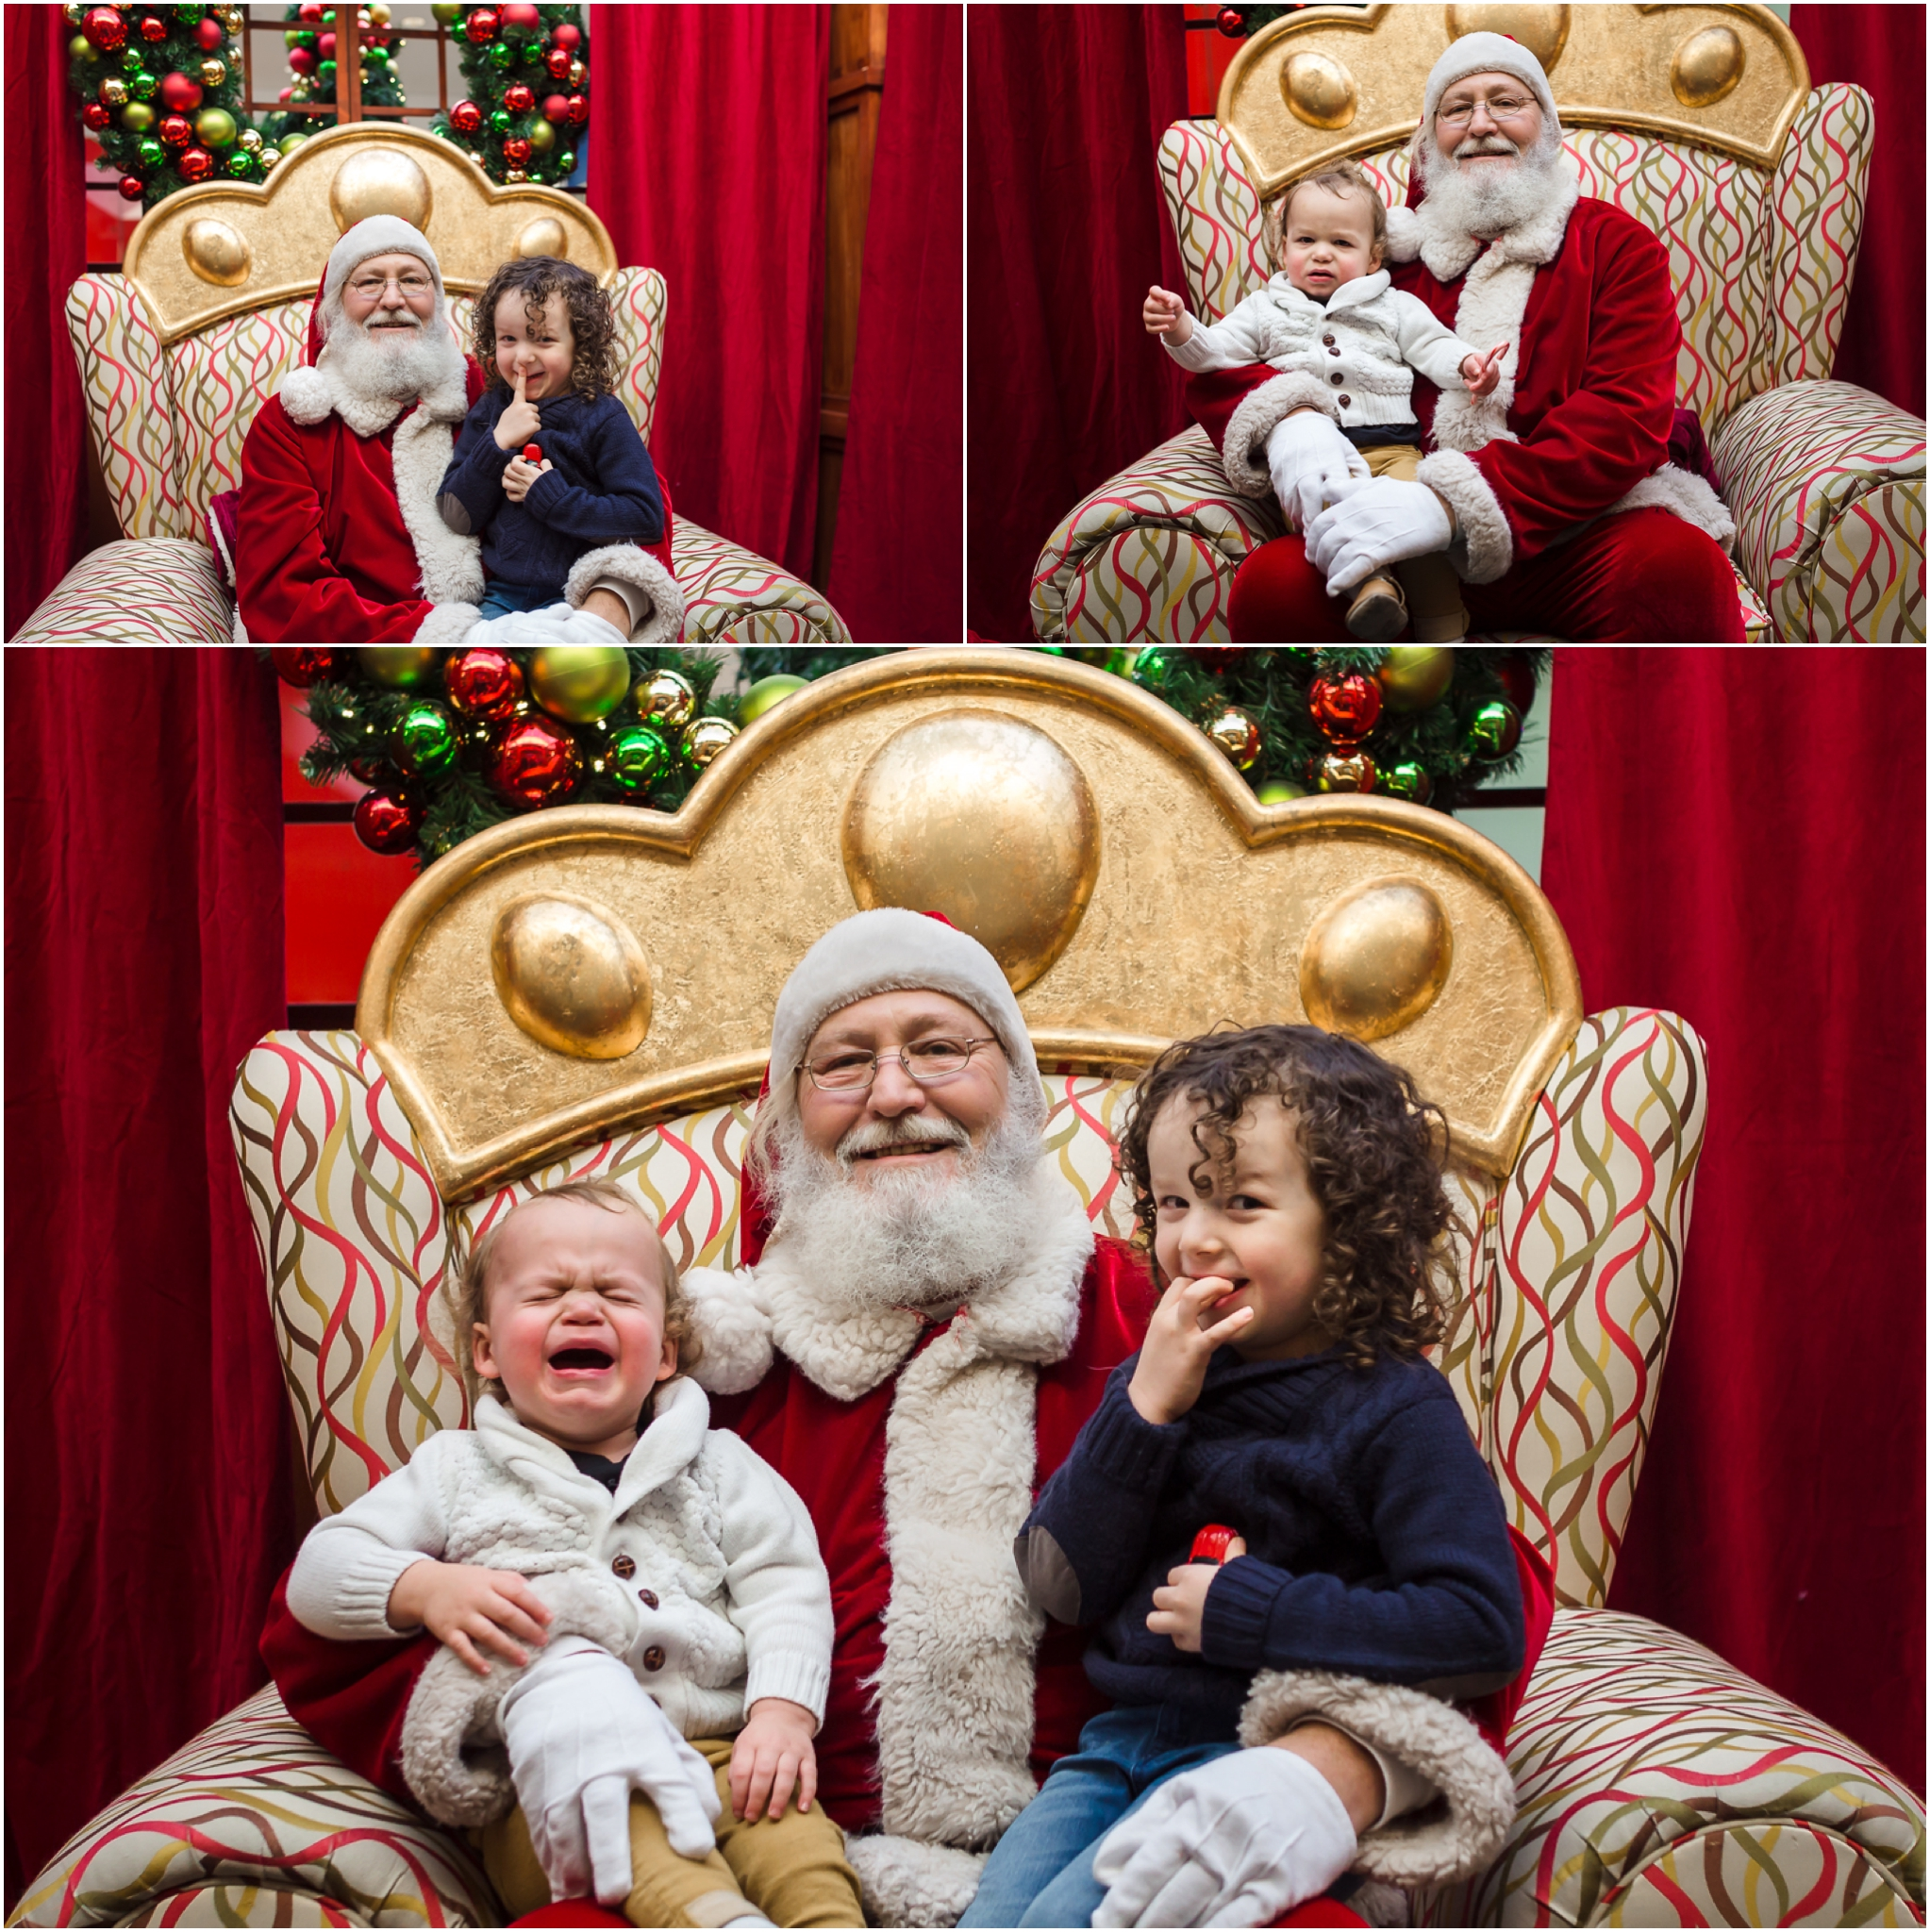 Edmonton family photographer - Best of 2016 - Santa - Brothers - Christmas - Holidays - Mall Santa